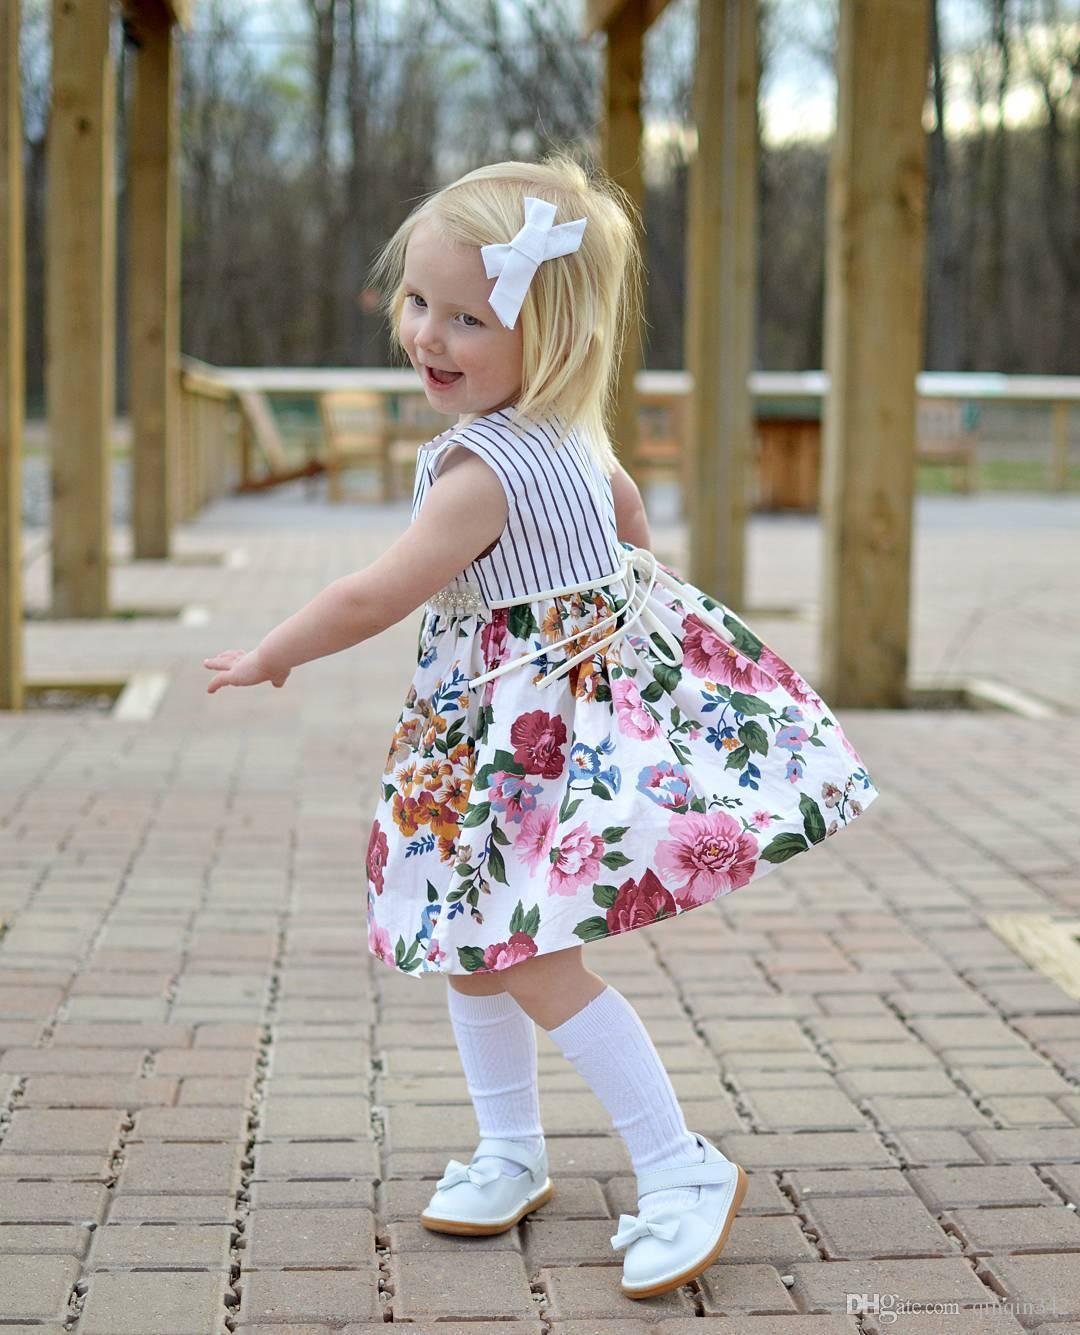 be4c951db 2019 2019 Baby Kids Designer Clothes Girls New Summer Dress Girl Big Flower  Dress Summer Children Sundress From Qinqin342, $0.11 | DHgate.Com